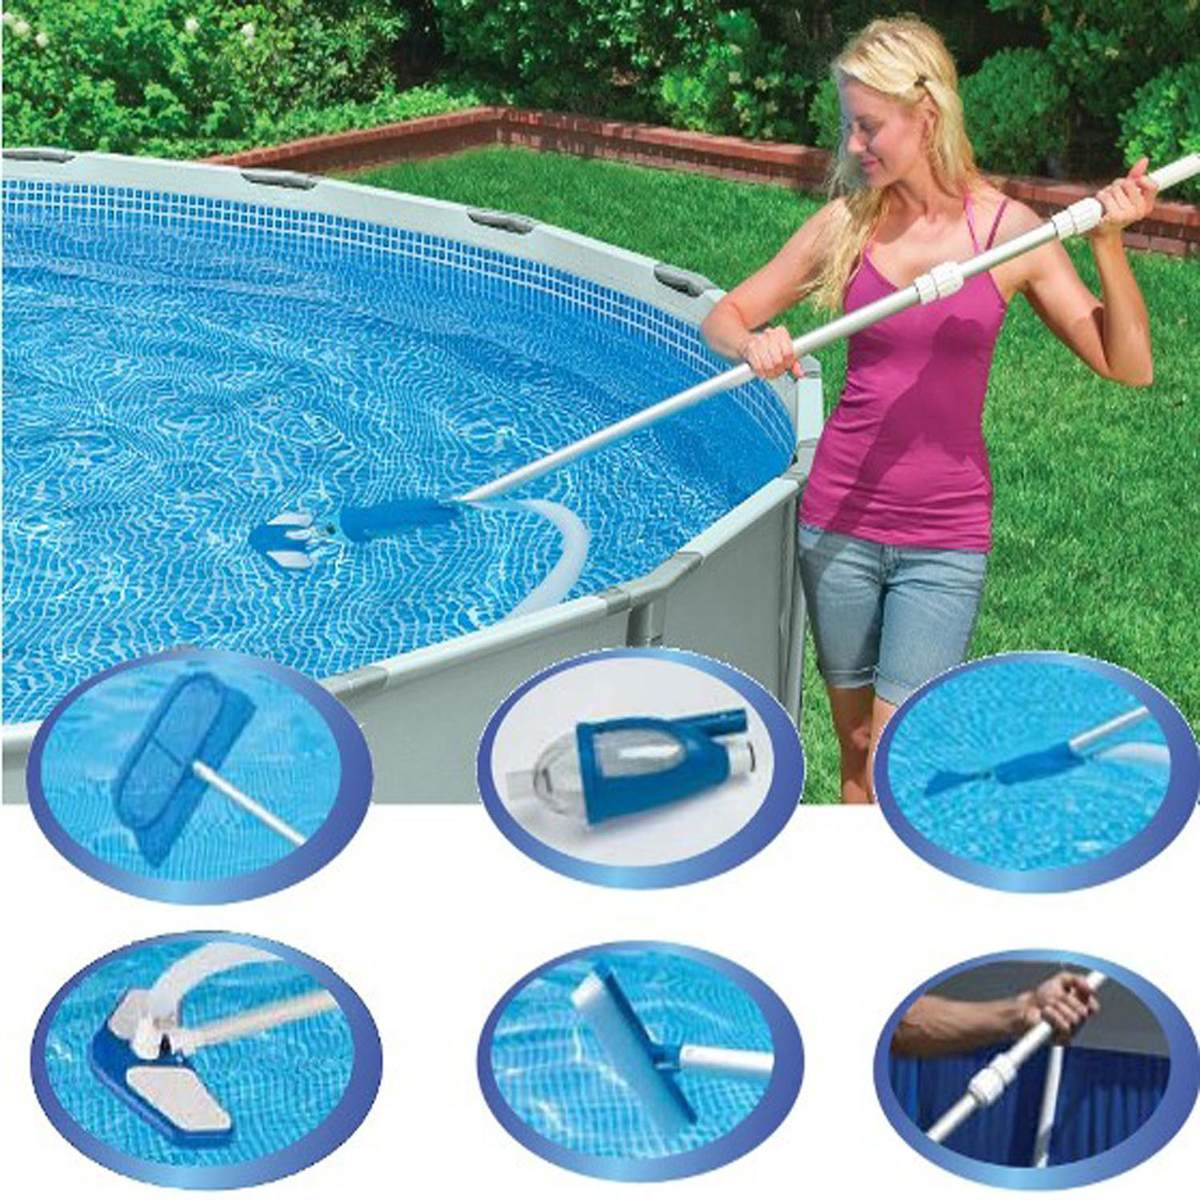 Kit de limpeza piscina deluxe aspirador escova vacuum intex r 249 99 em mercado livre - Aspiradora para piscina ...